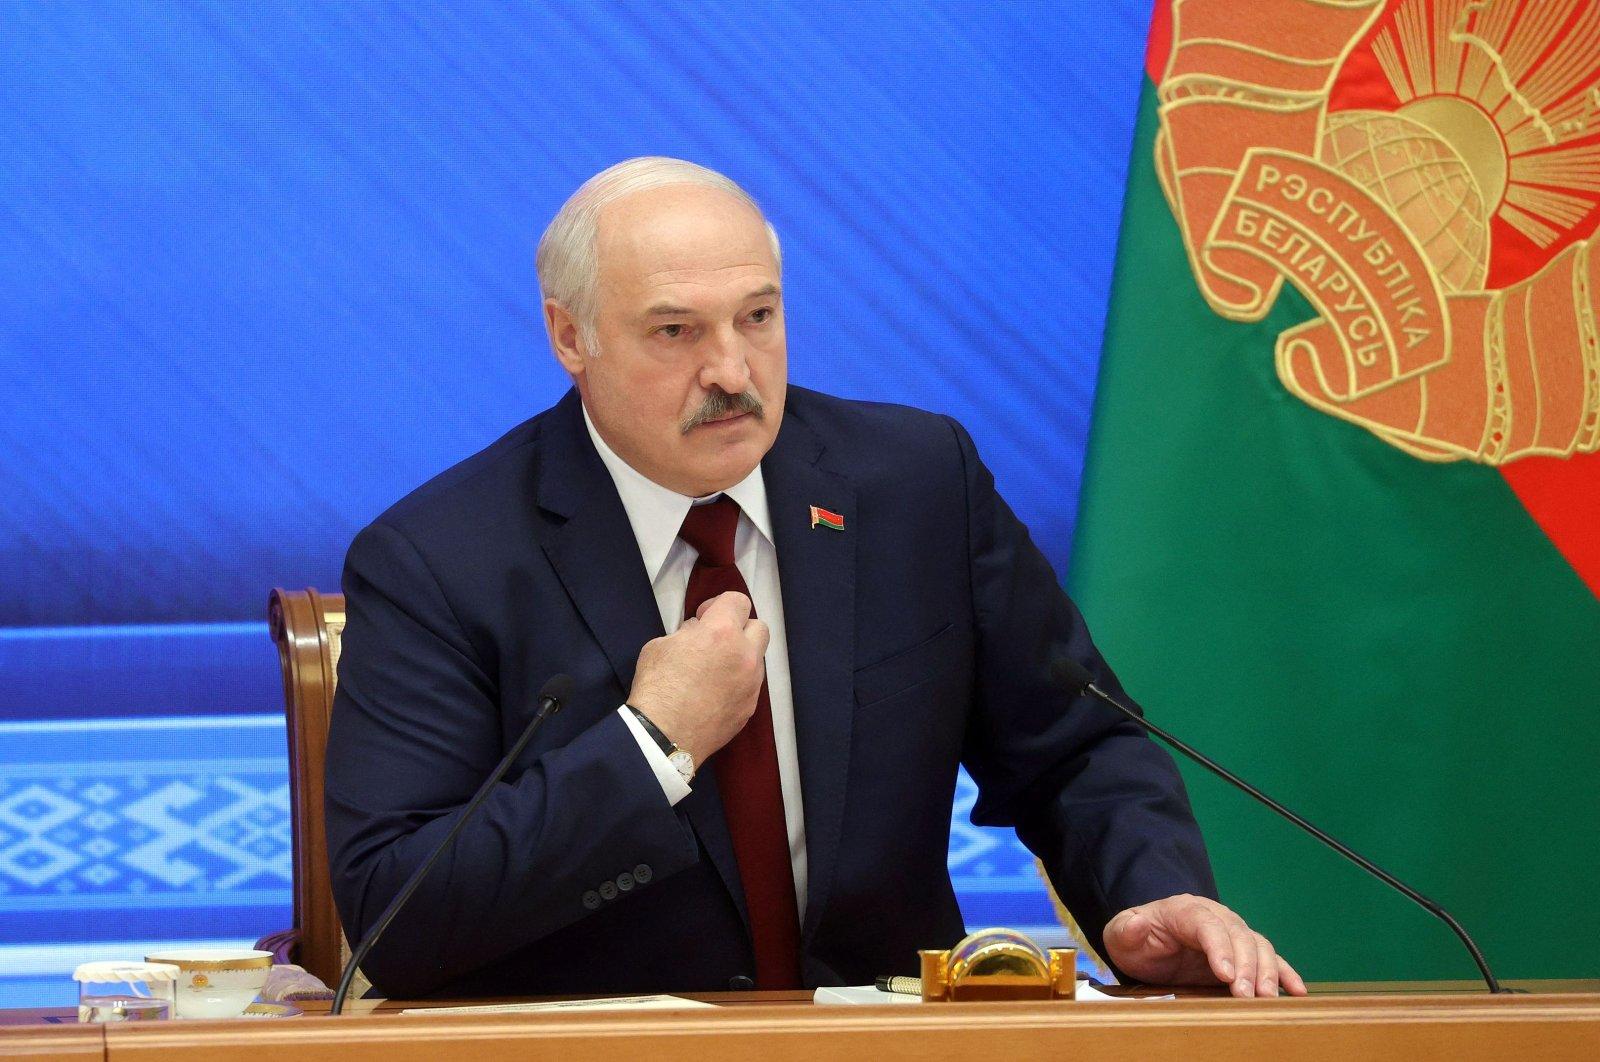 Belarus' President Alexander Lukashenko speaks during a press conference in Minsk on Aug. 9, 2021. (AFP Photo)